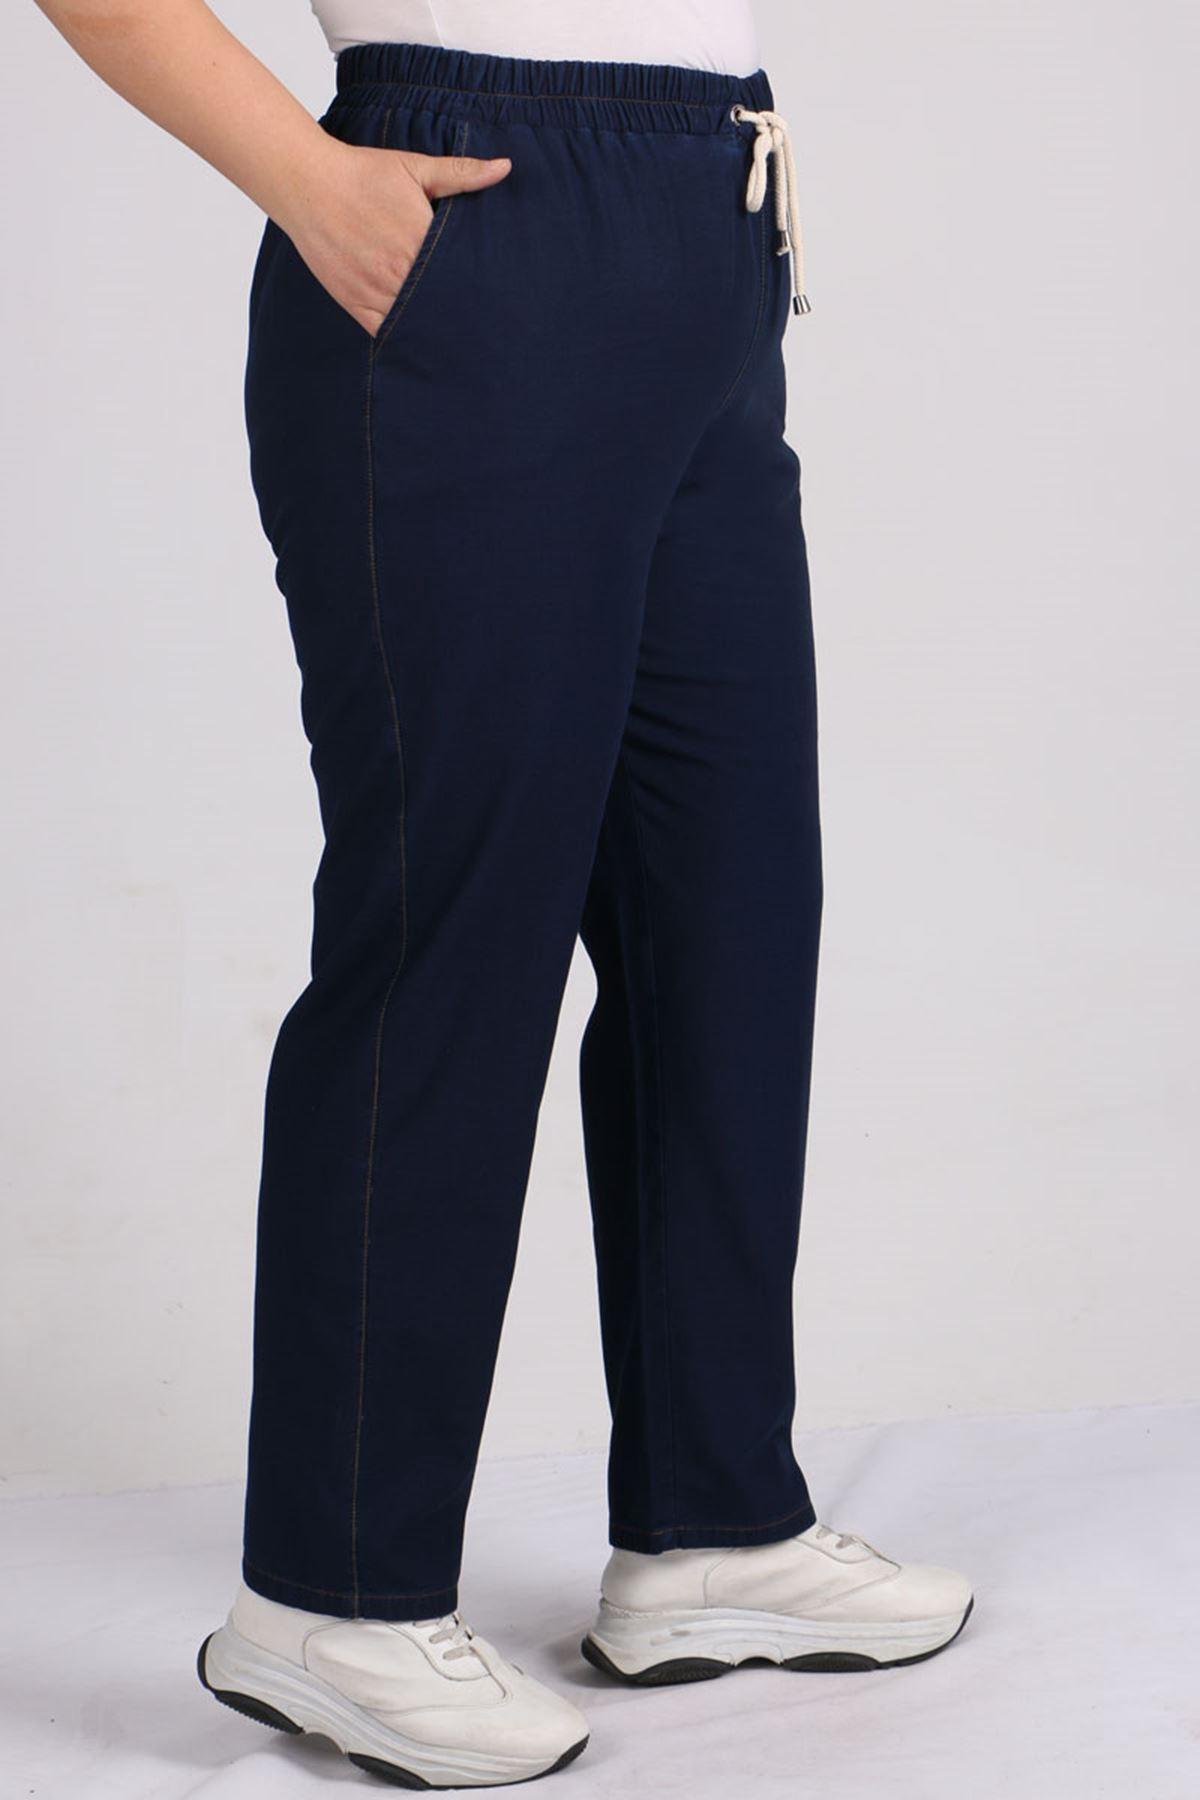 9154 Plus Size Elastic Waist Skinny Leg Jeans - Dark Navy Blue